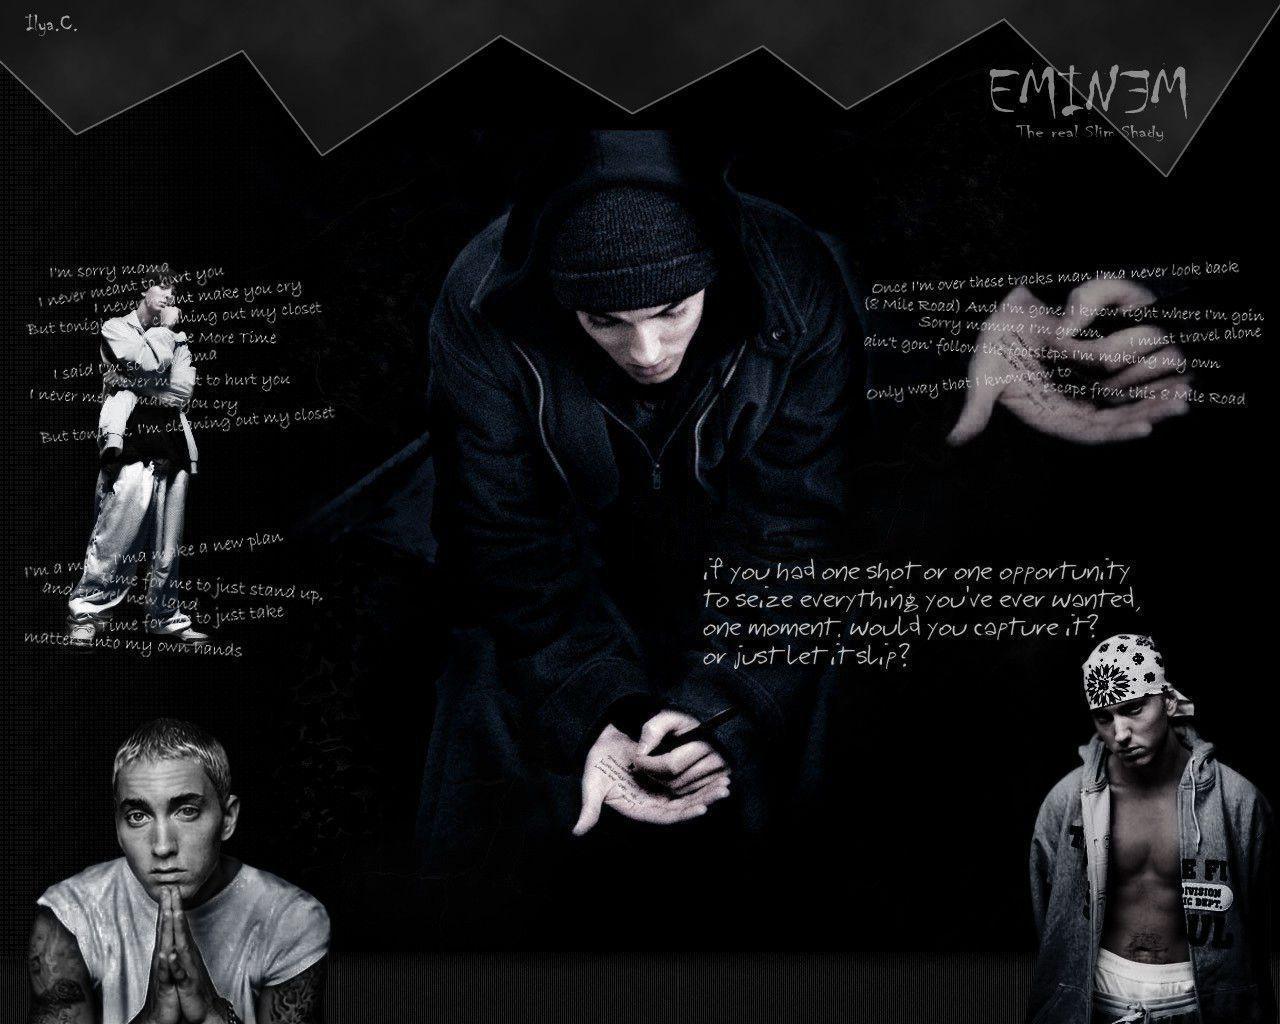 Eminem - EMINEM Wallpaper (9776513) - Fanpop